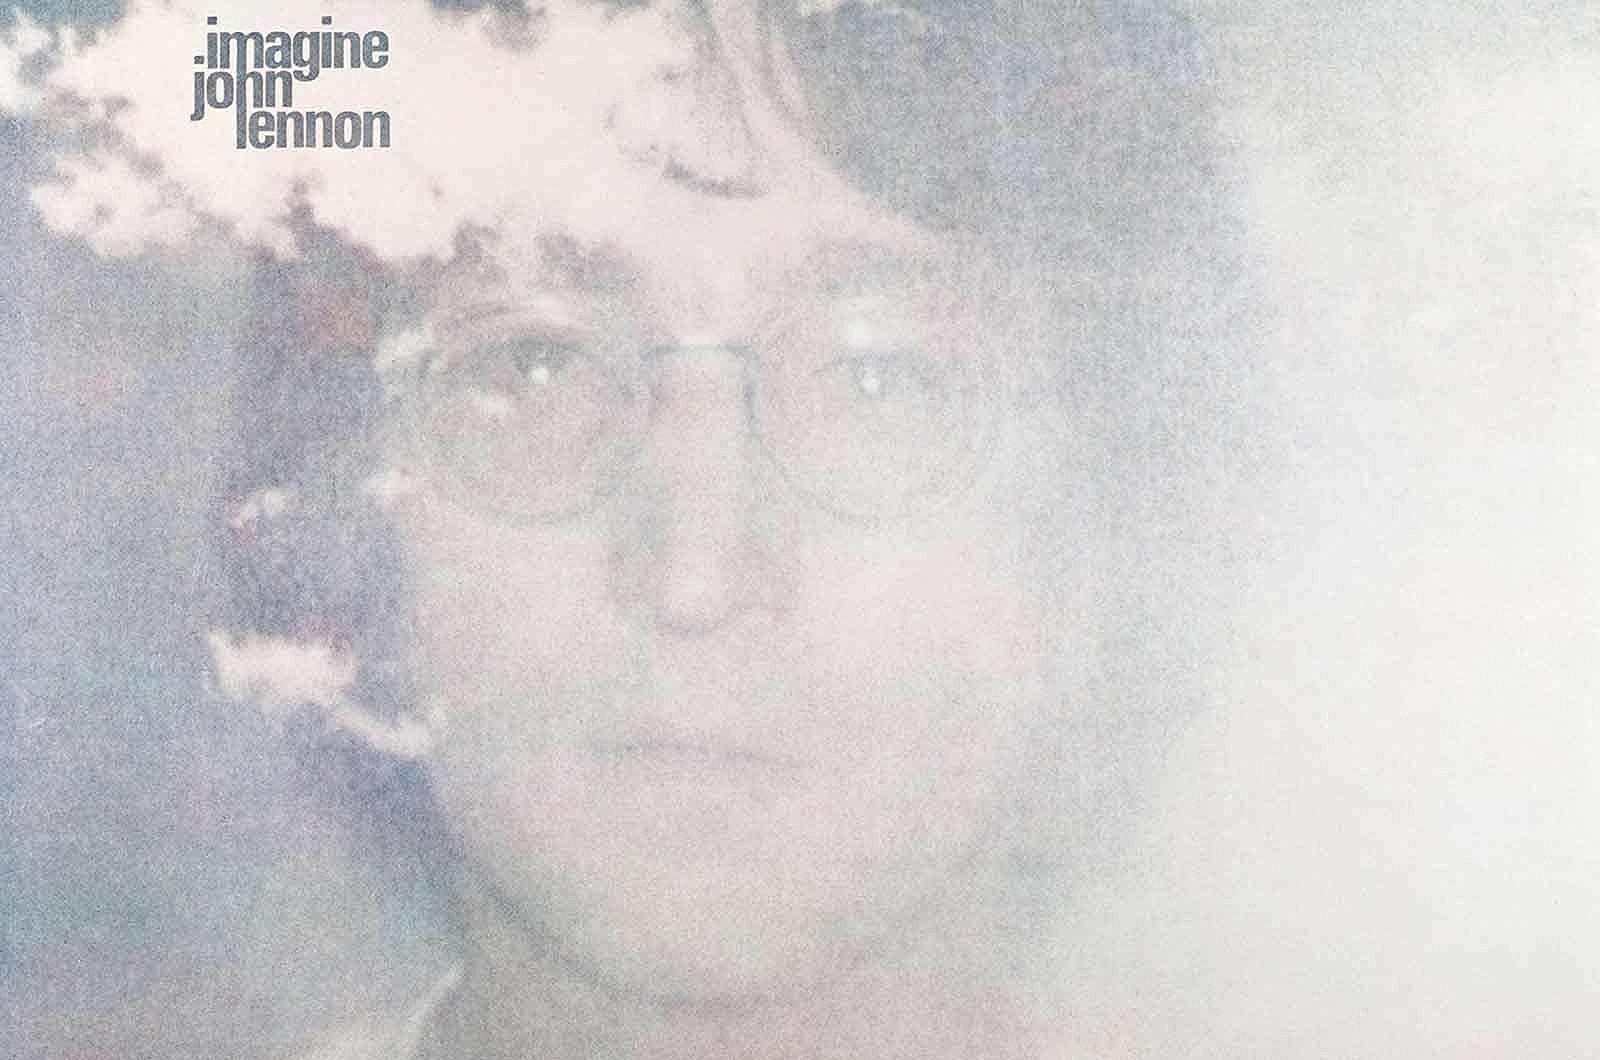 ELTON JOHN DE E JOHN LENNON BAIXAR CD